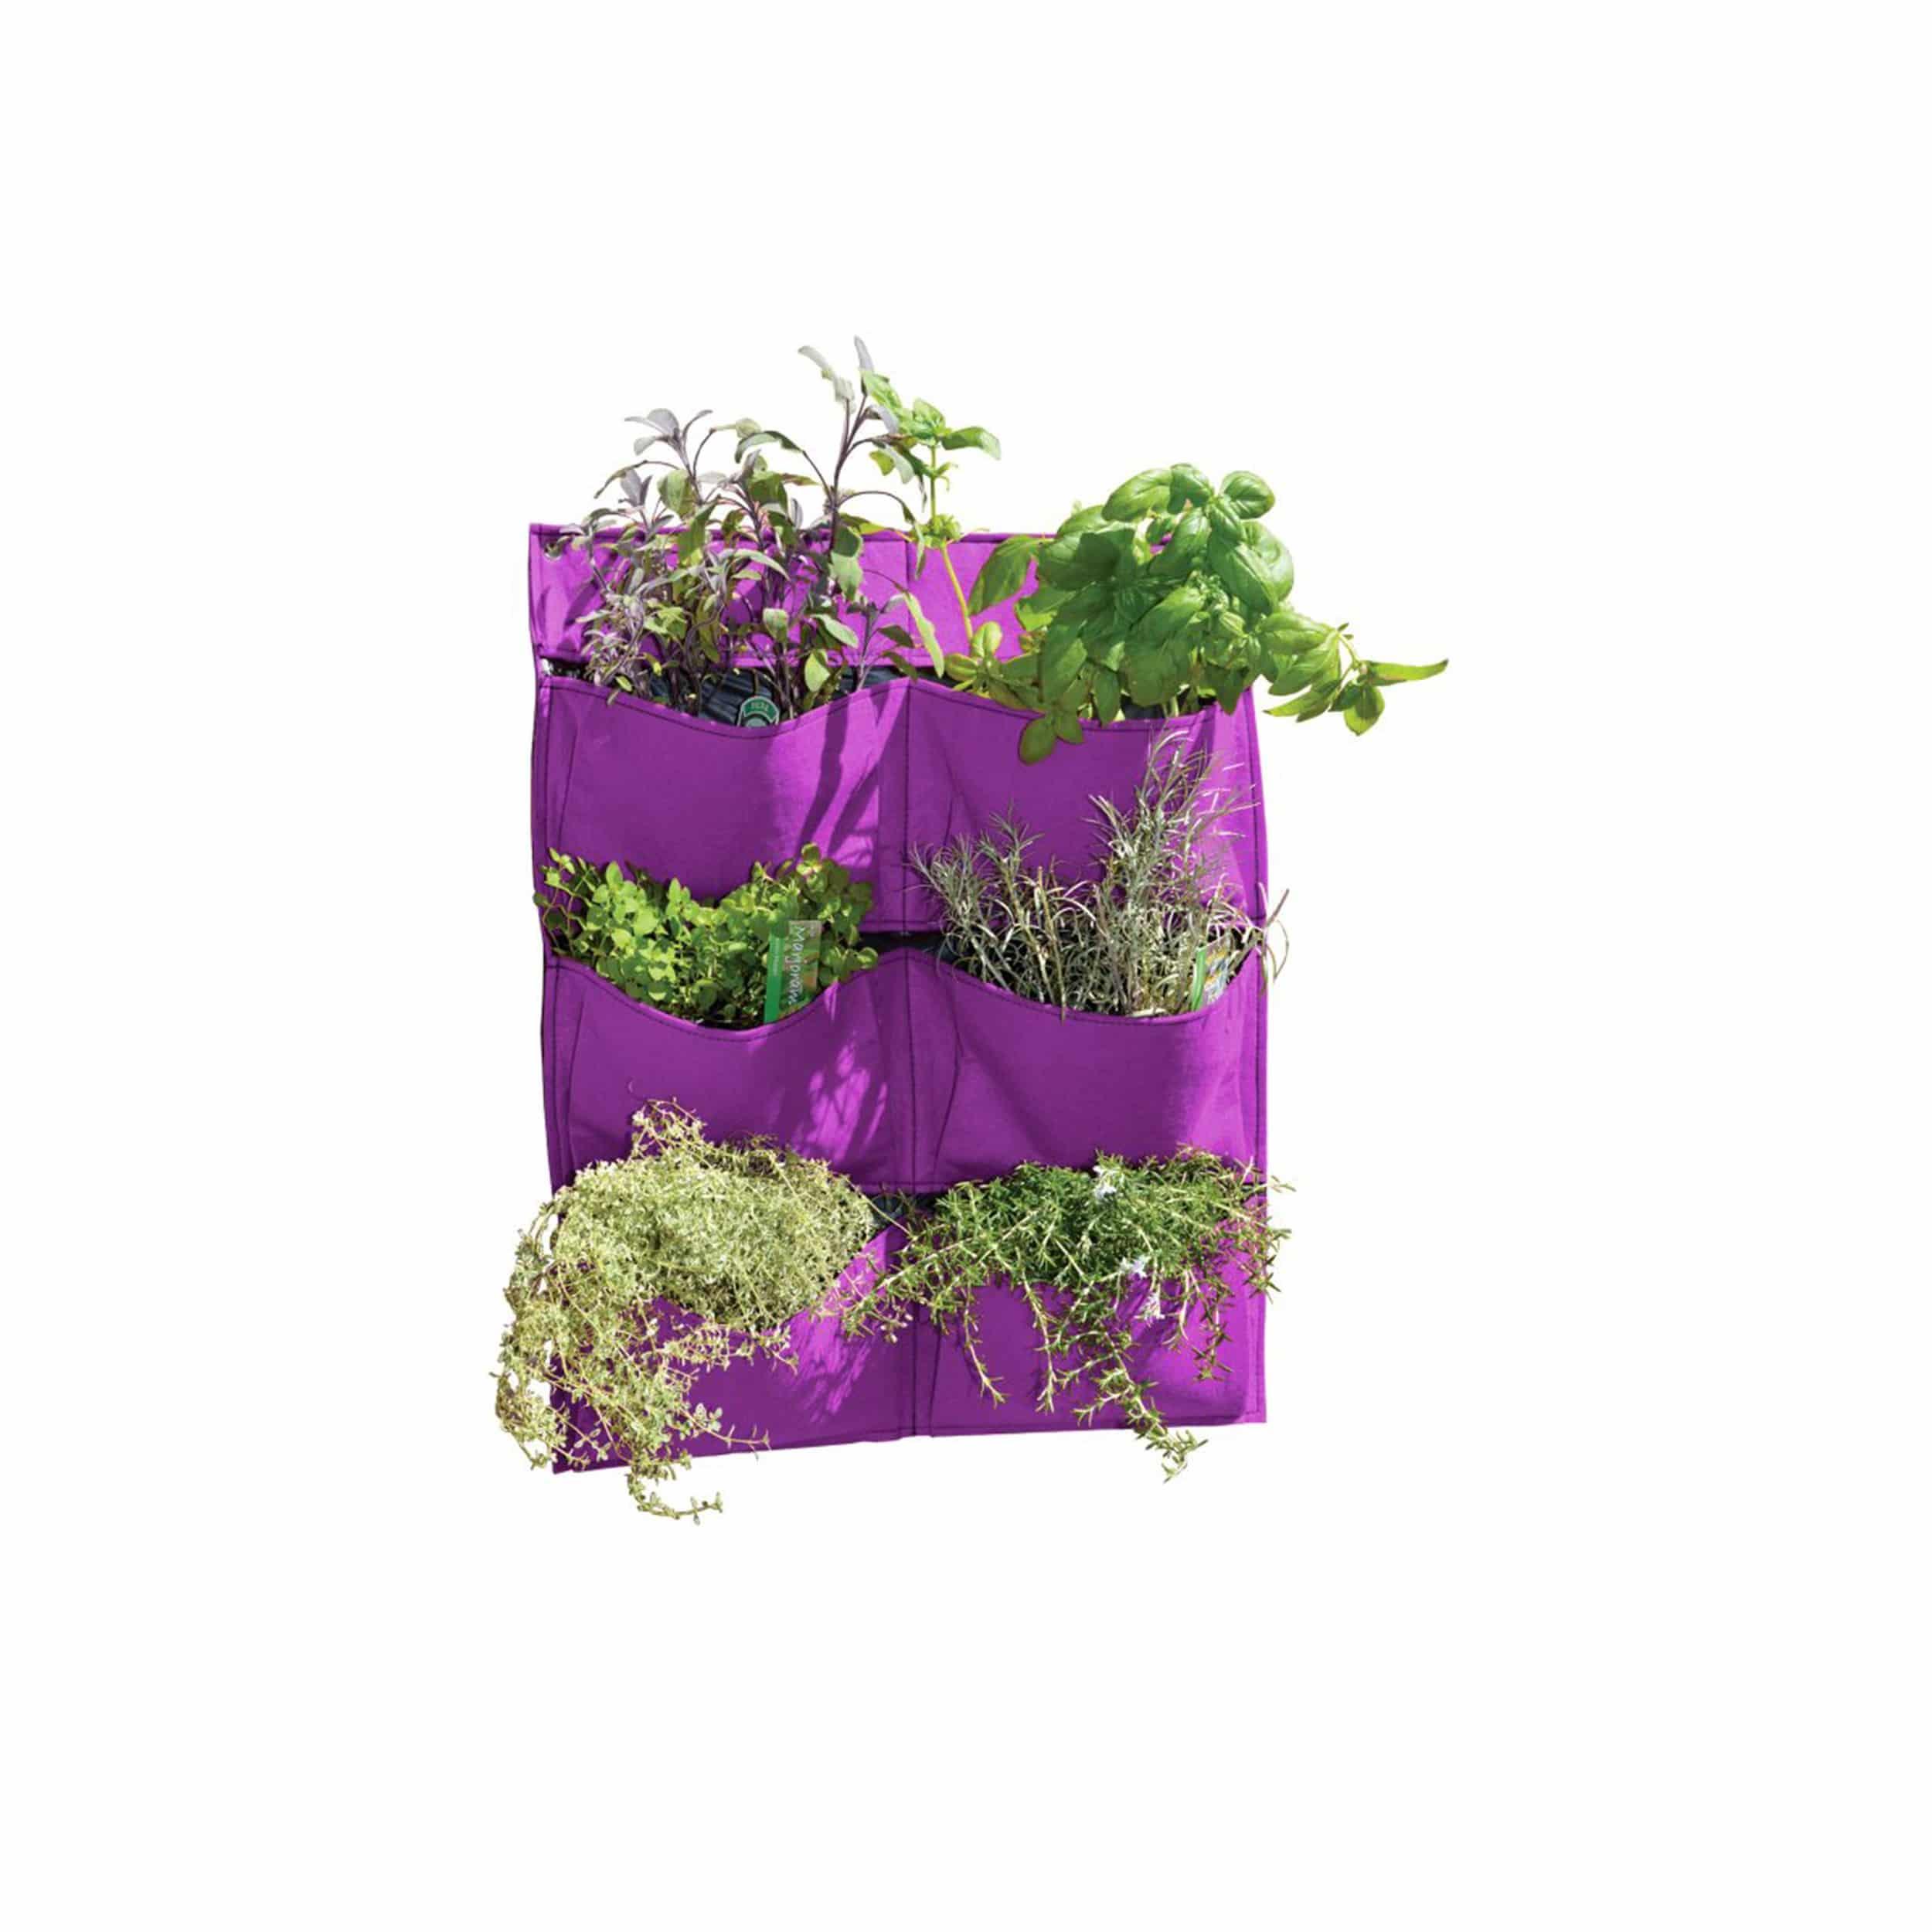 Pflanztasche Living Wall mit 6 Pflanztaschen H70cm lila